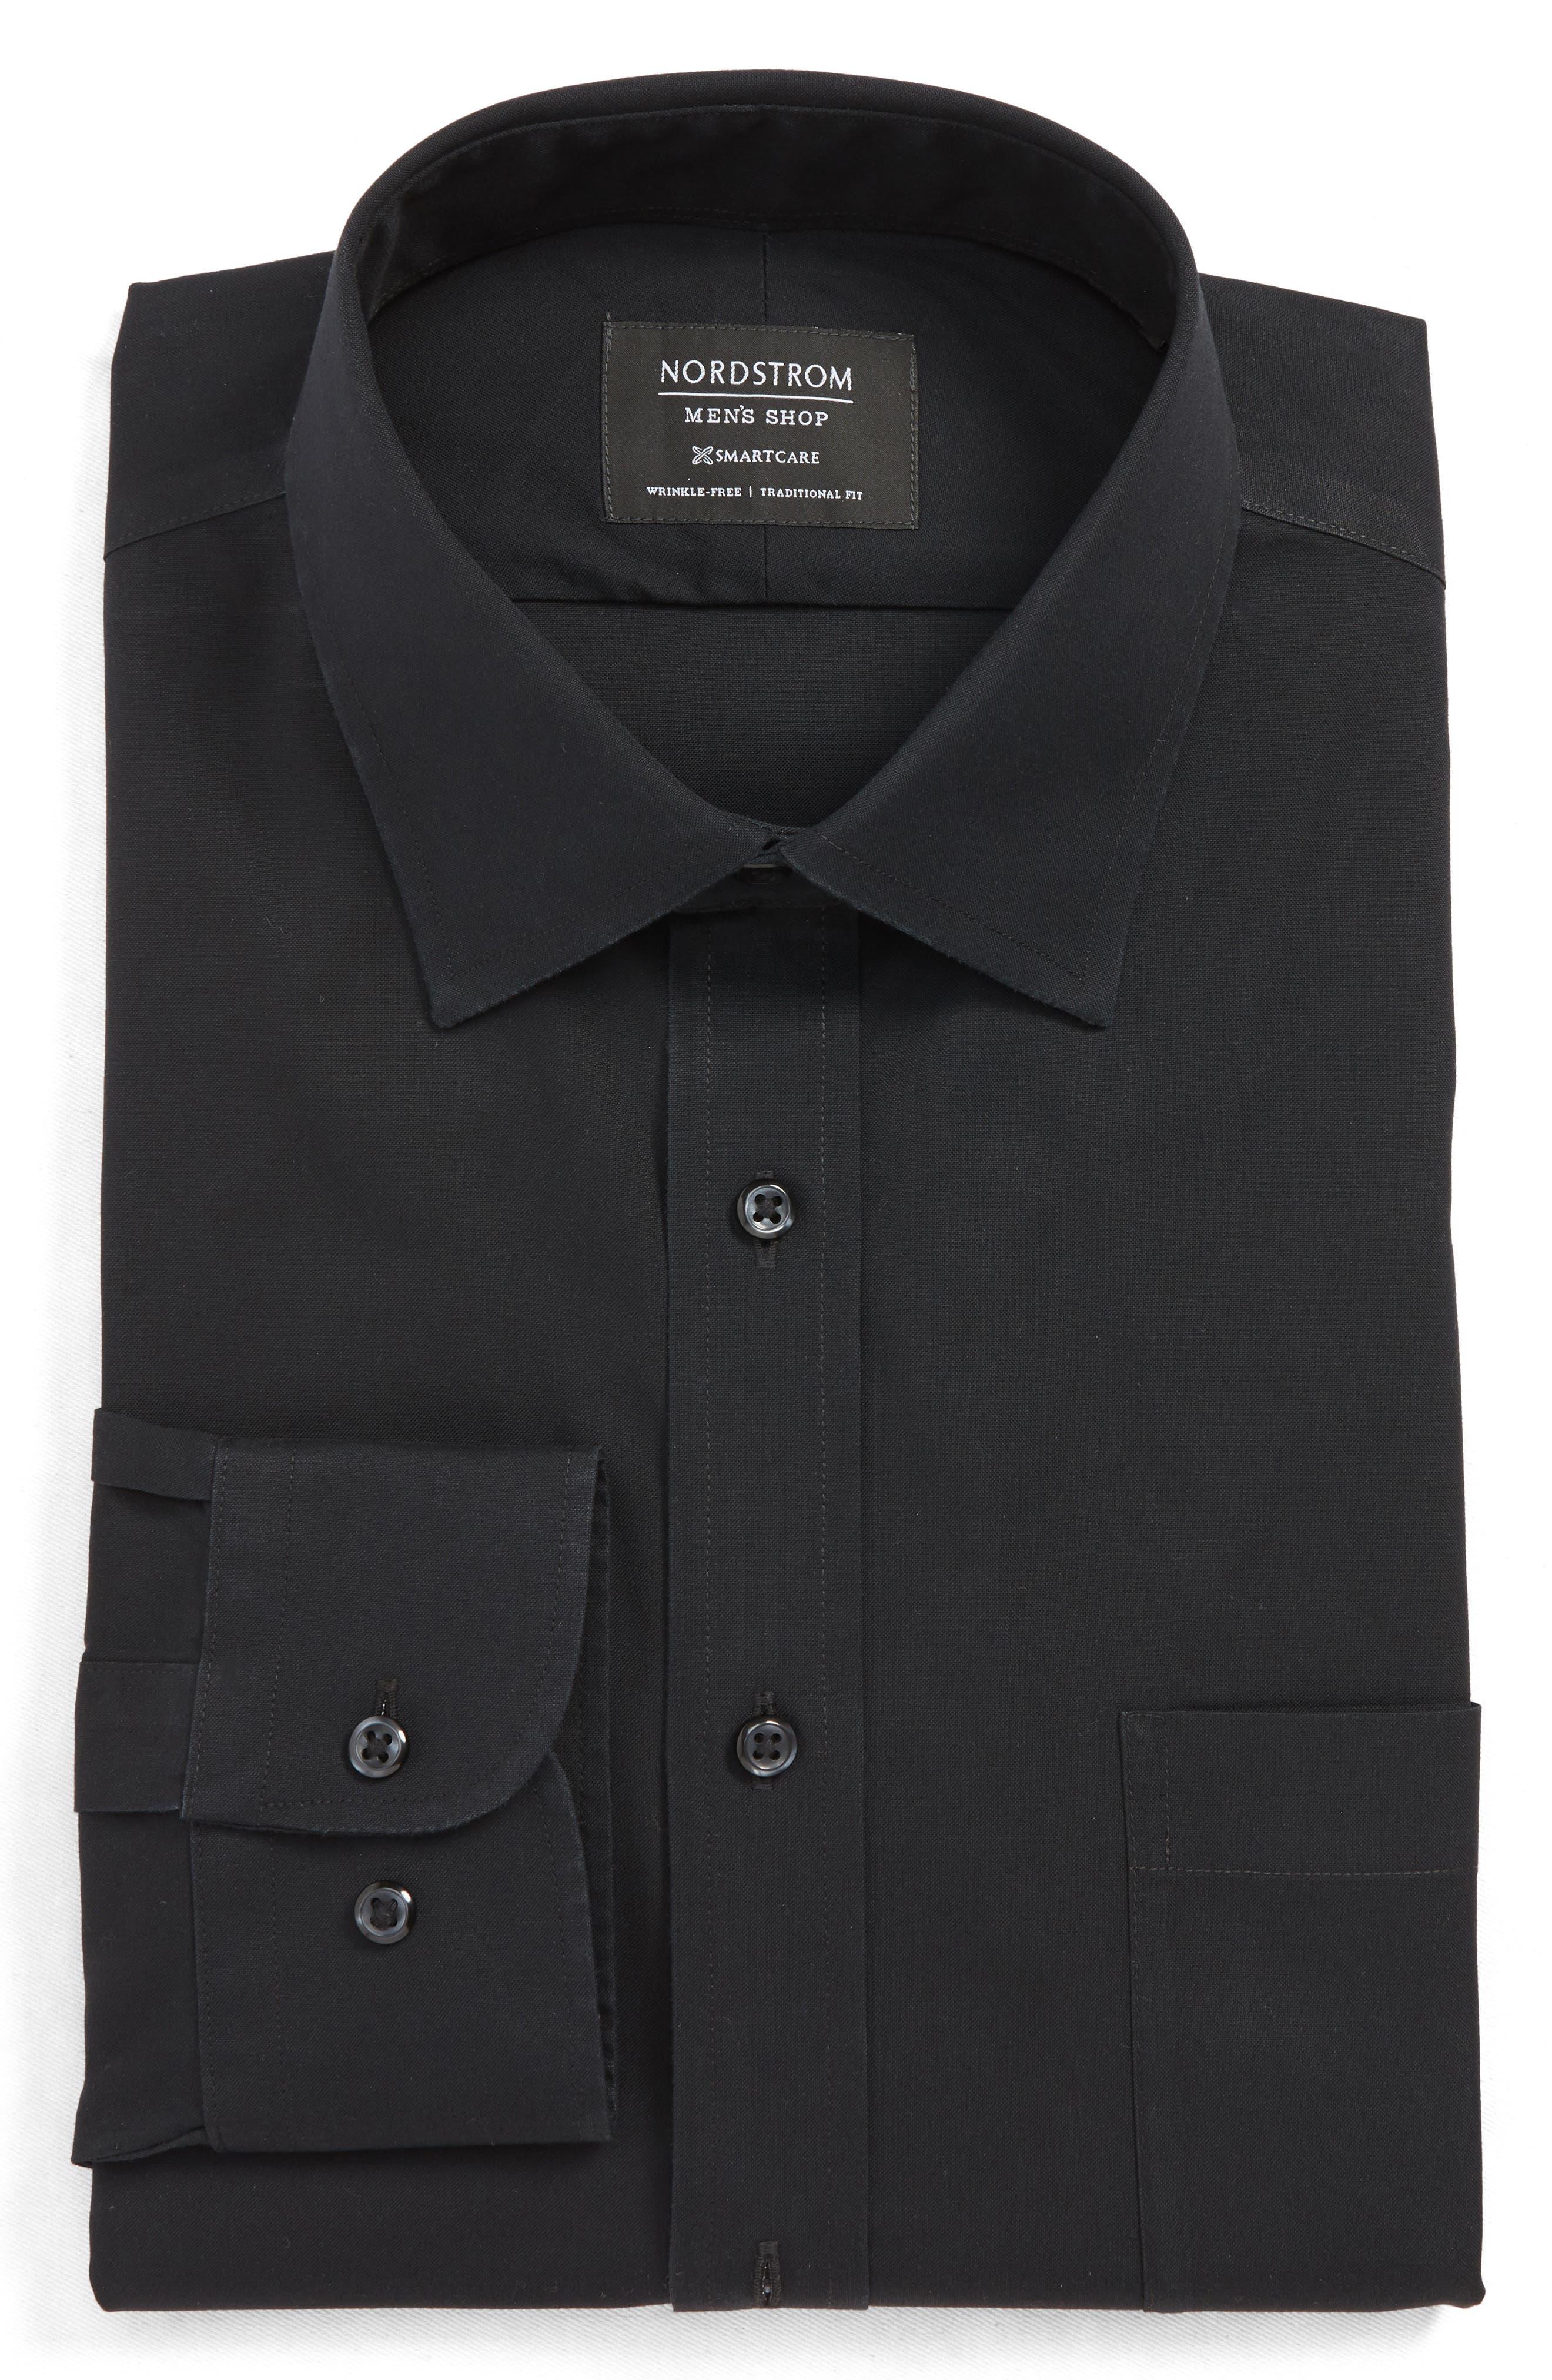 e5b3bb965 Nordstrom Shop Smartcare(TM) Traditional Fit Dress Shirt - Black